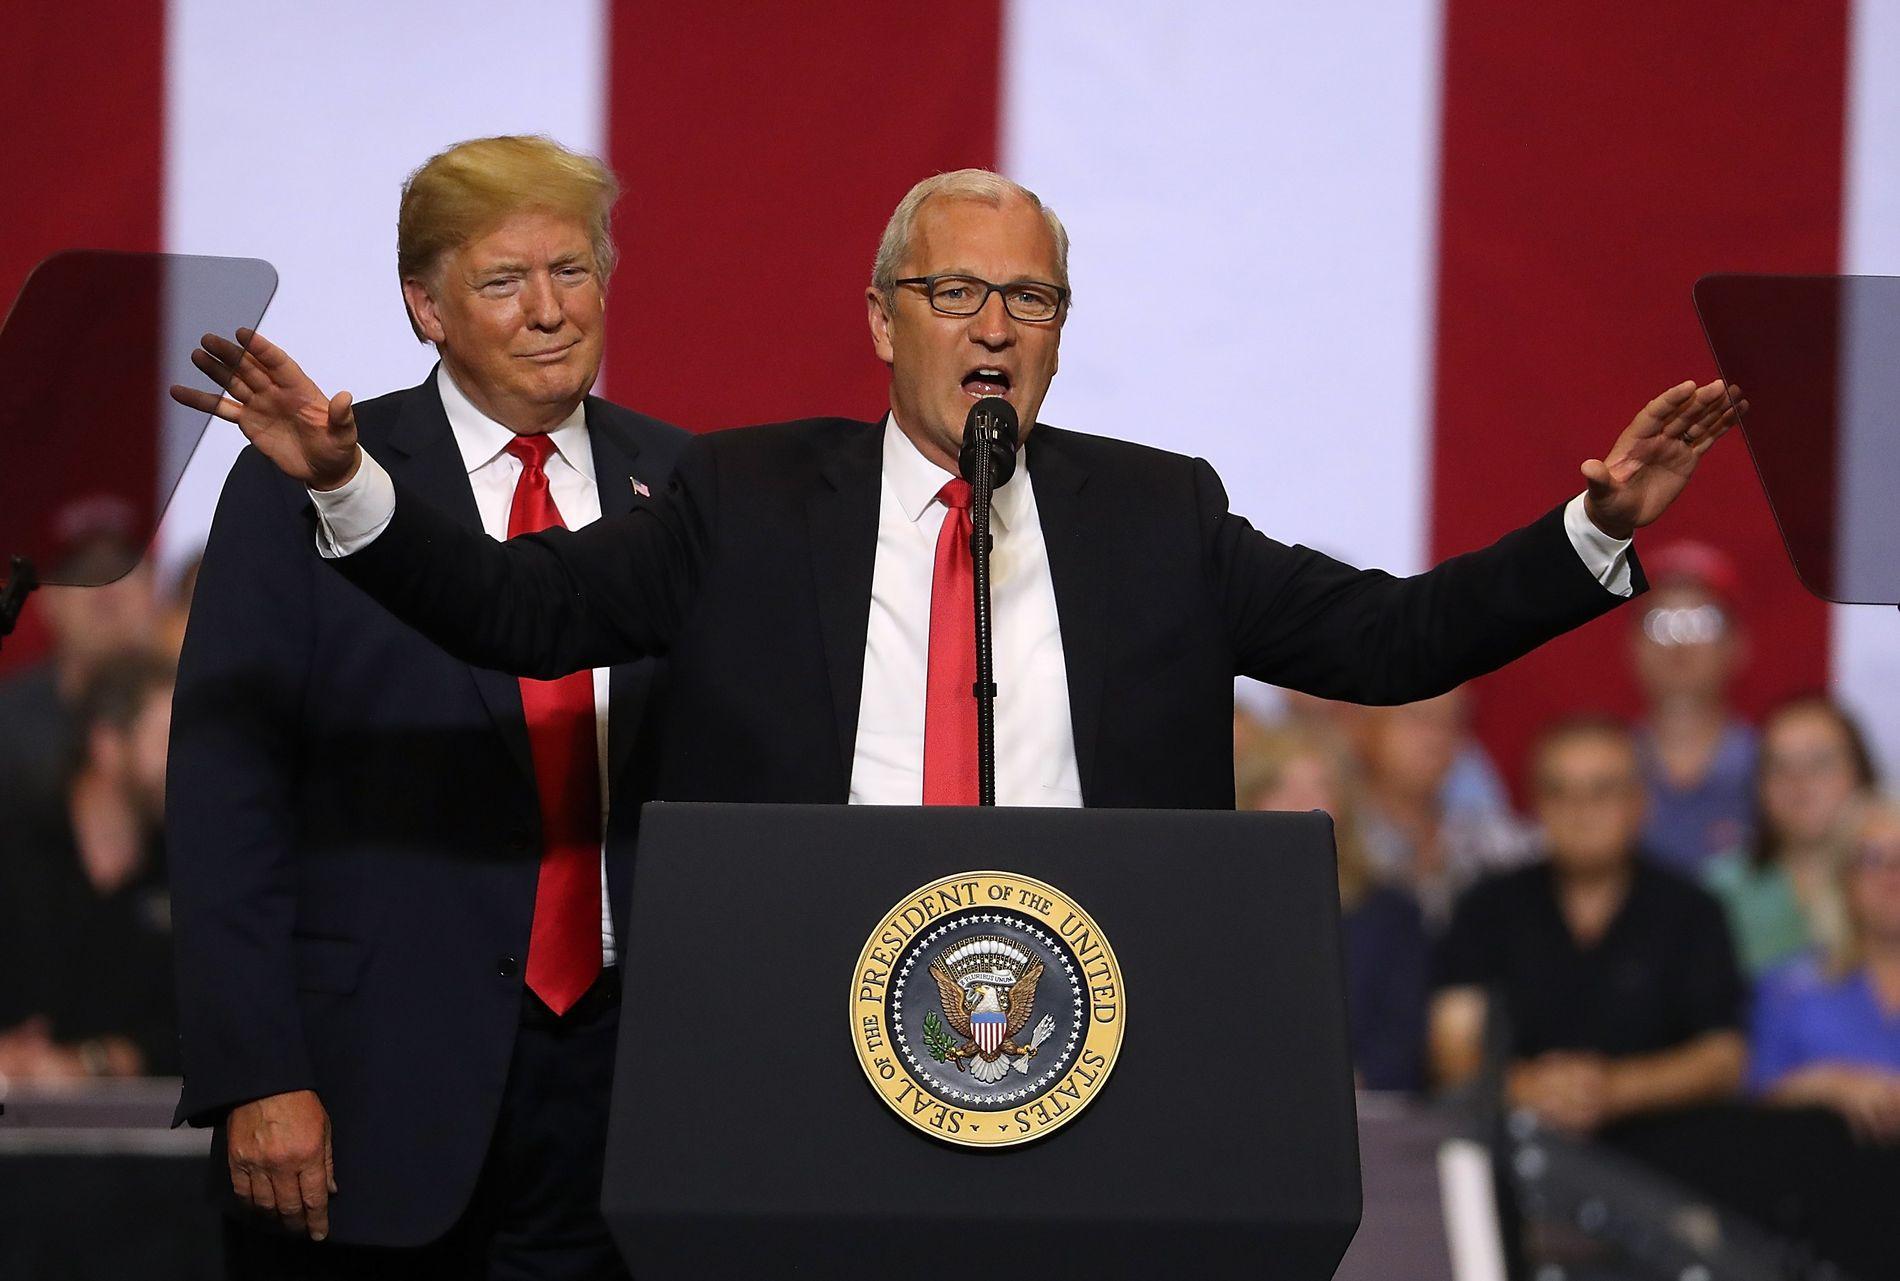 VALGKAMP: President Donald Trump deltar på en valgkamparrangement med Kevin Cramer i Fargo i Nord-Dakota 27. juni. Cramer er republikanernes kandidat som senator i mellomvalget 6. november.